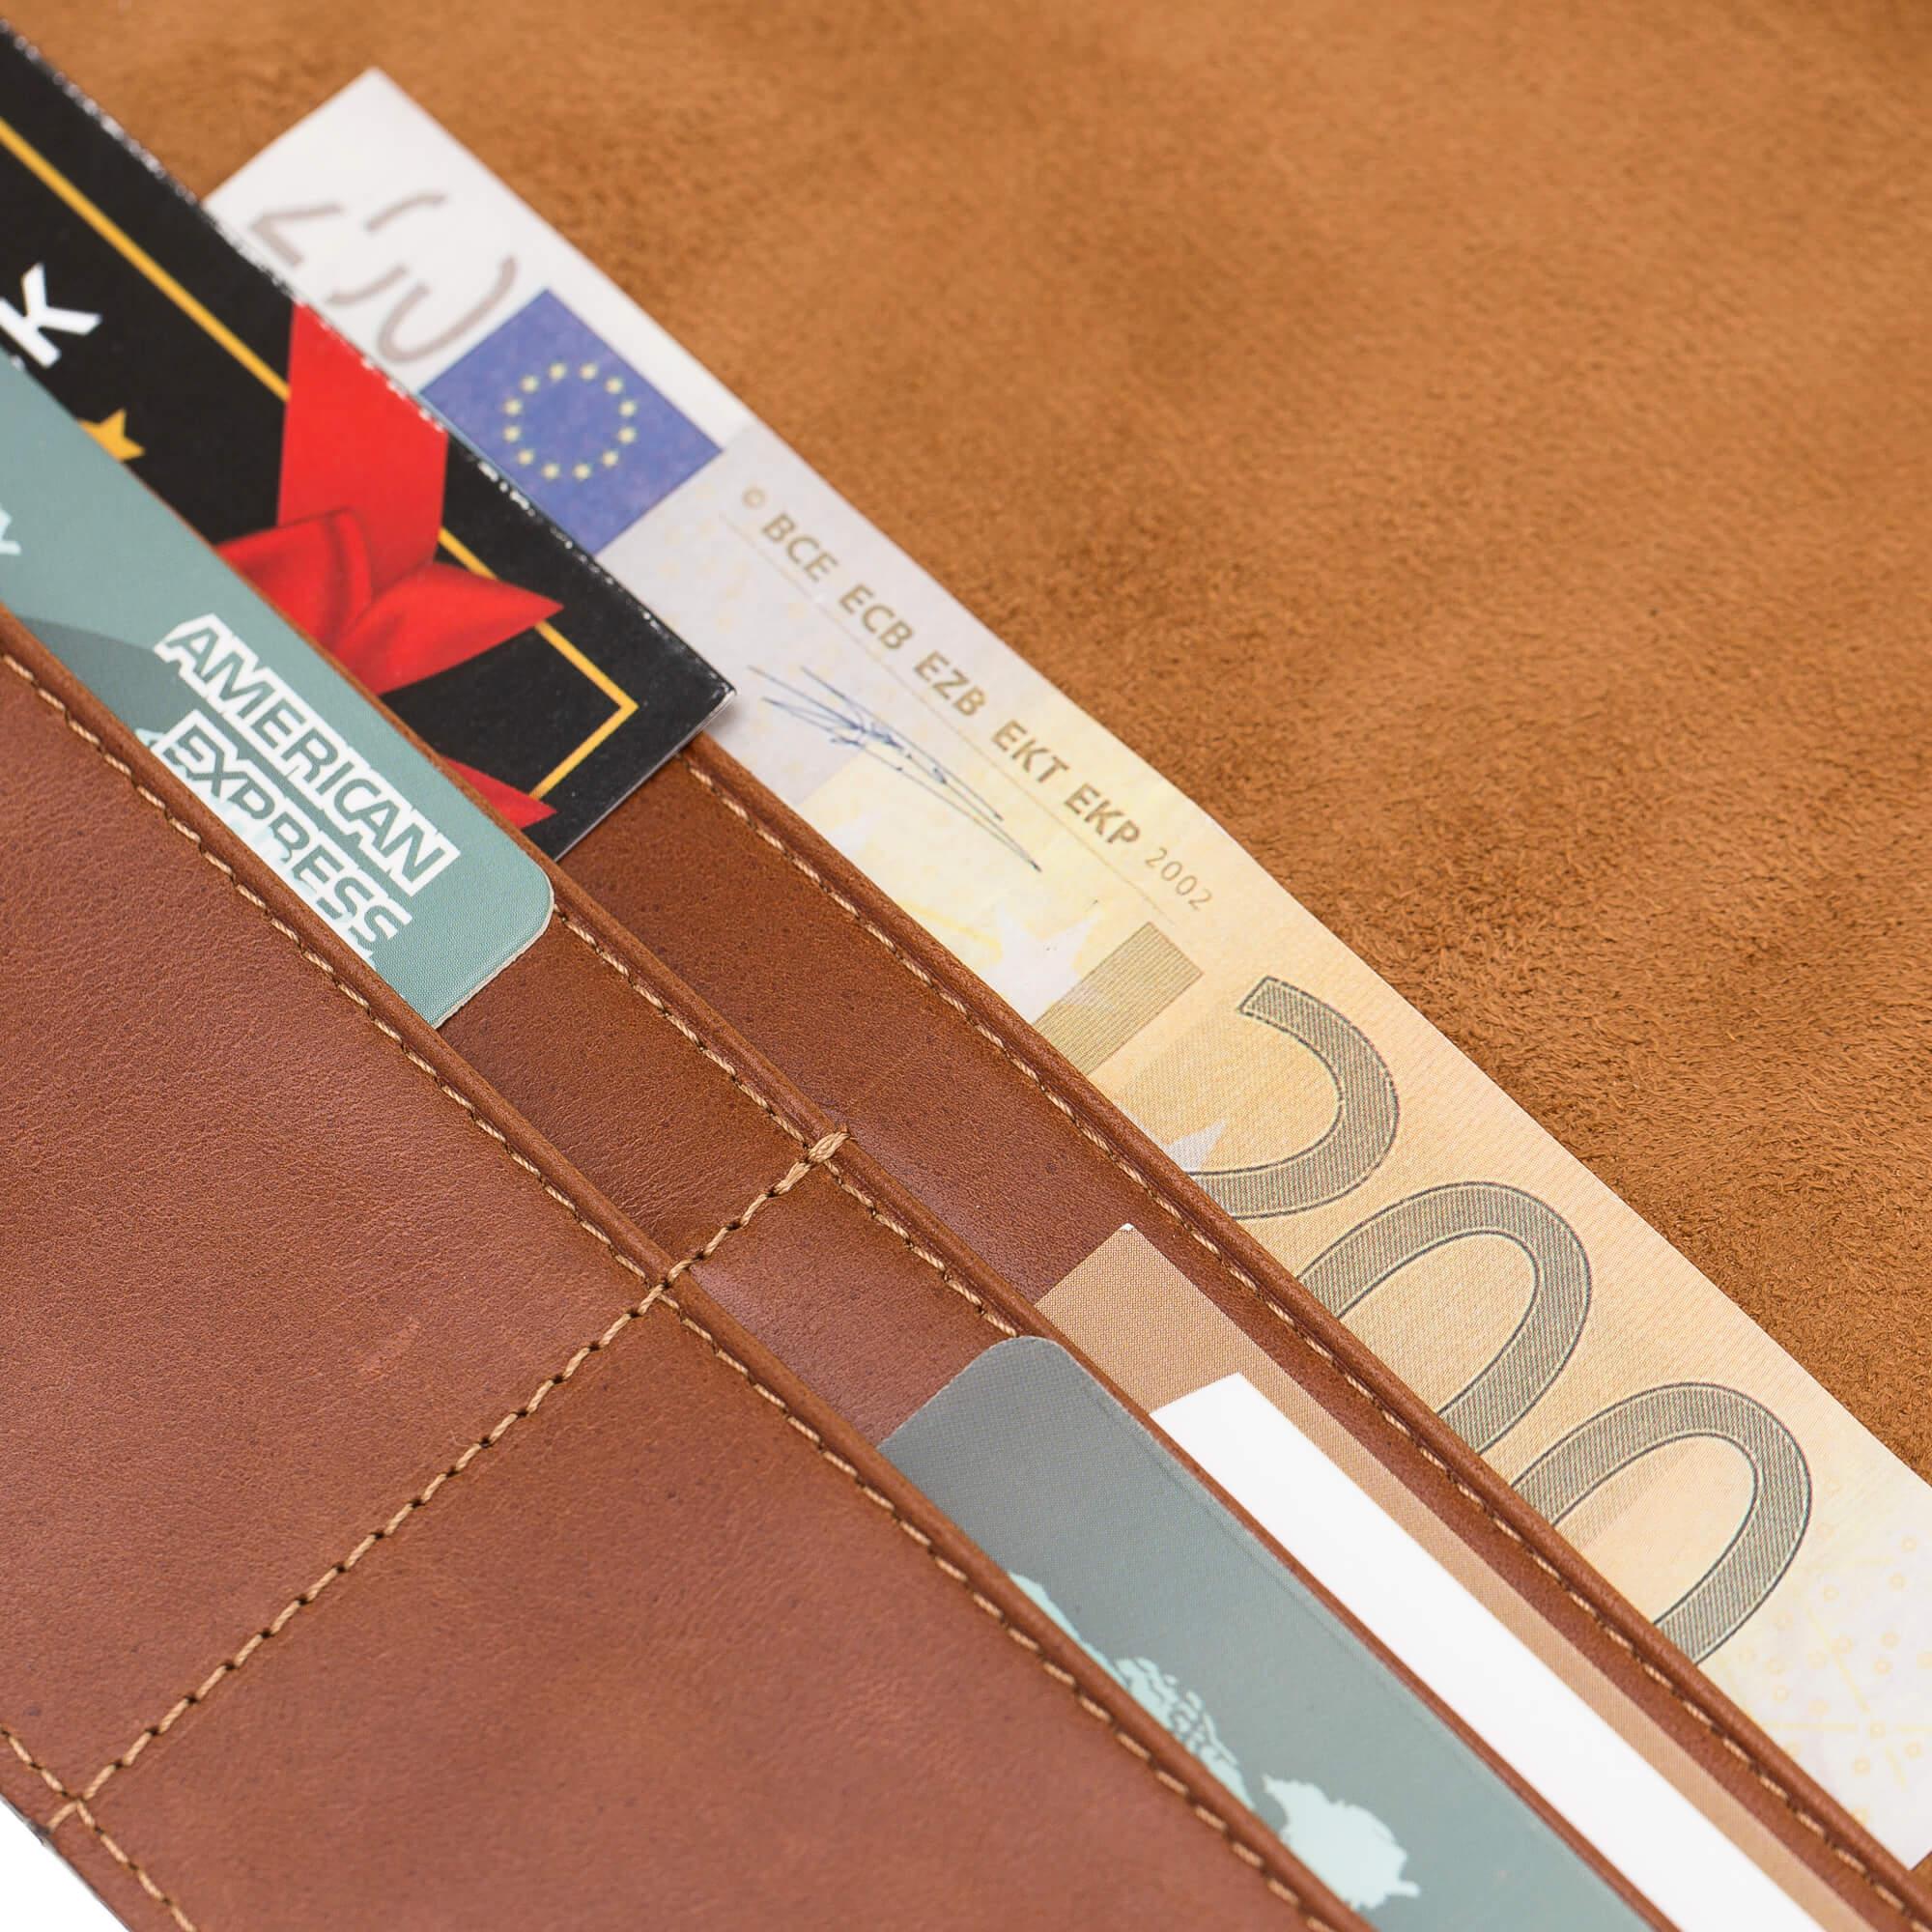 "iPad 9,7 Zoll 2018 Tasche aus echtem Leder ""Miami"" in Cognac Braun Burned"